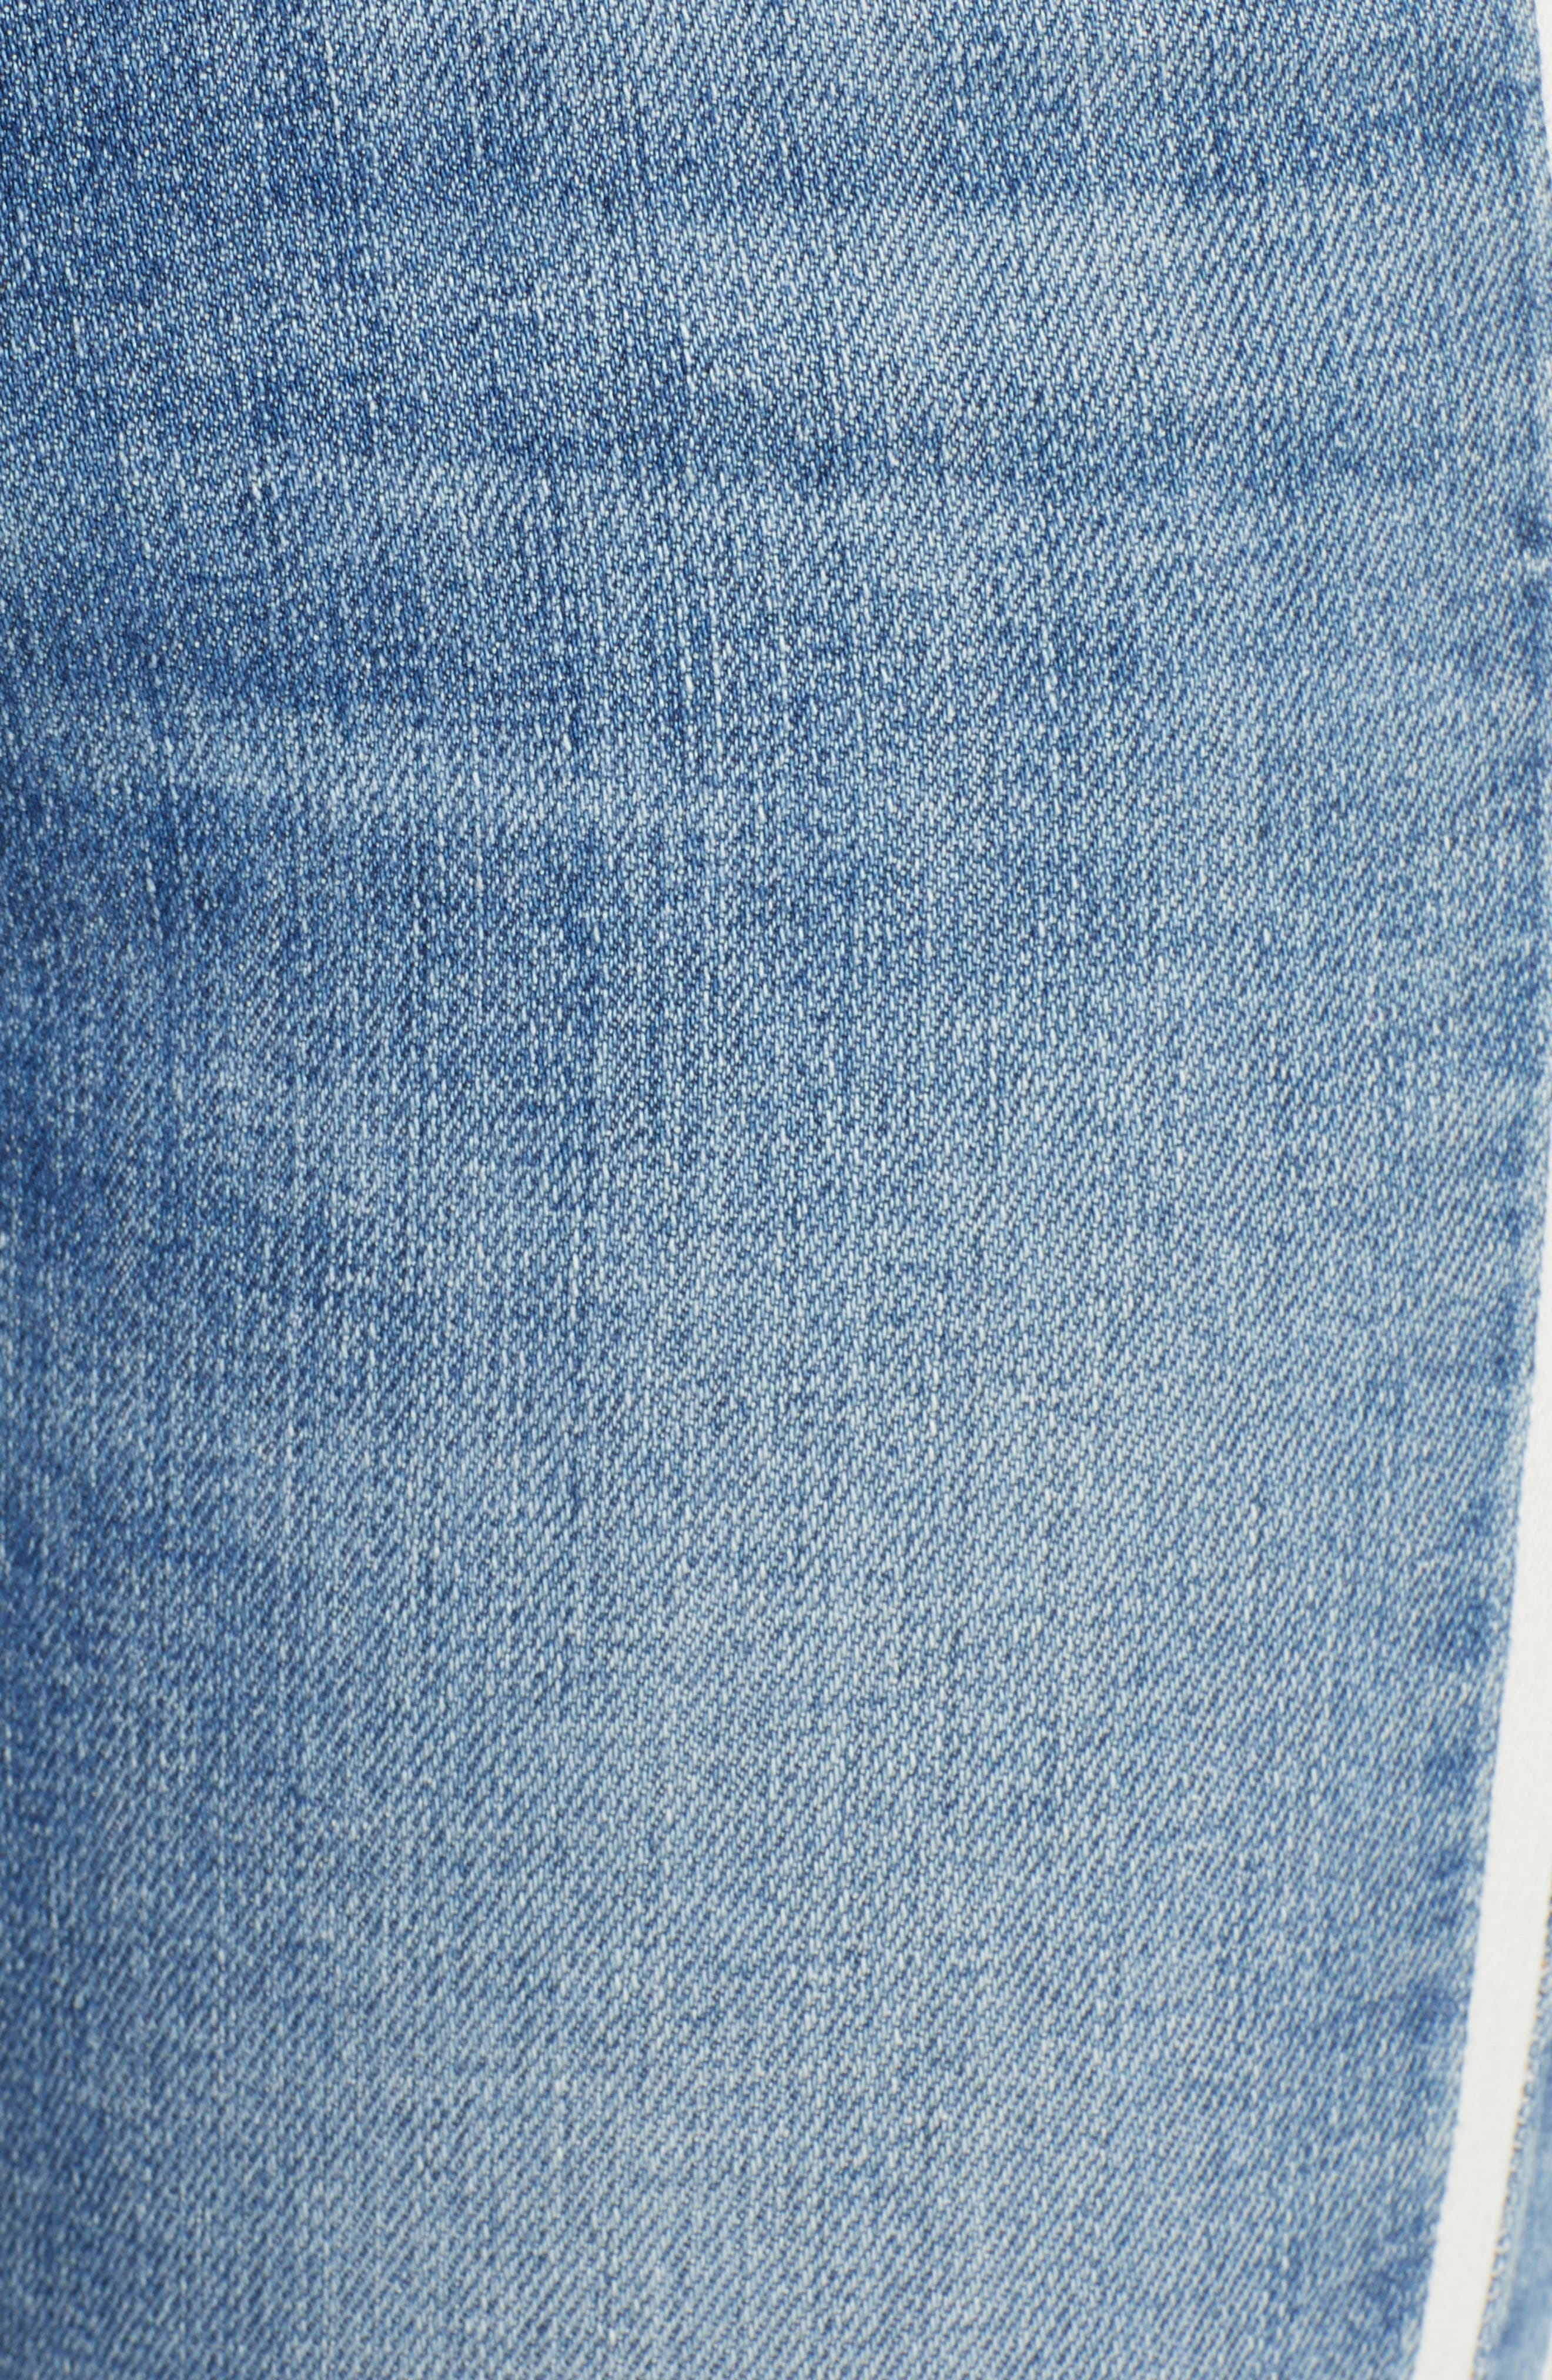 7 FOR ALL MANKIND<SUP>®</SUP>, Side Stripe Ankle Skinny Jeans, Alternate thumbnail 6, color, SLOANE VINTAGE